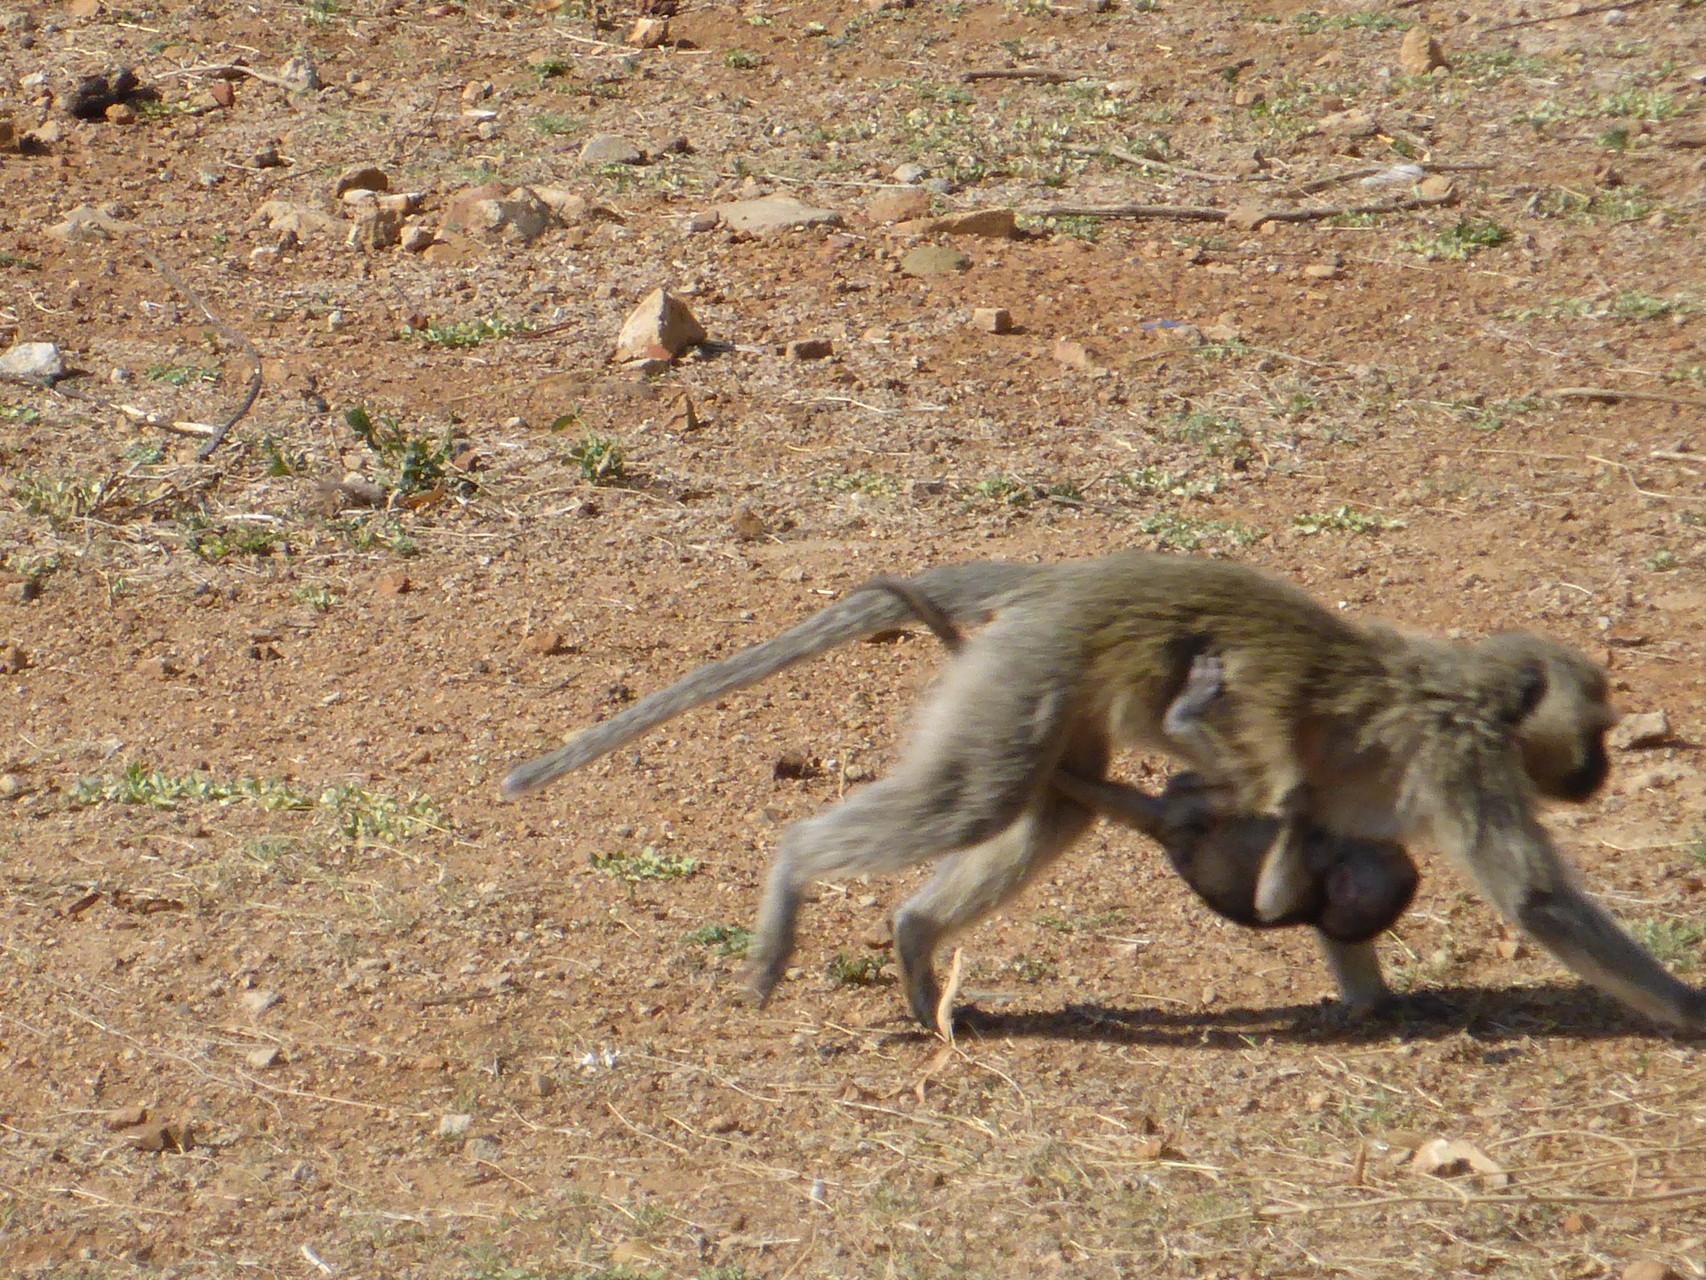 a baby monkey *-*